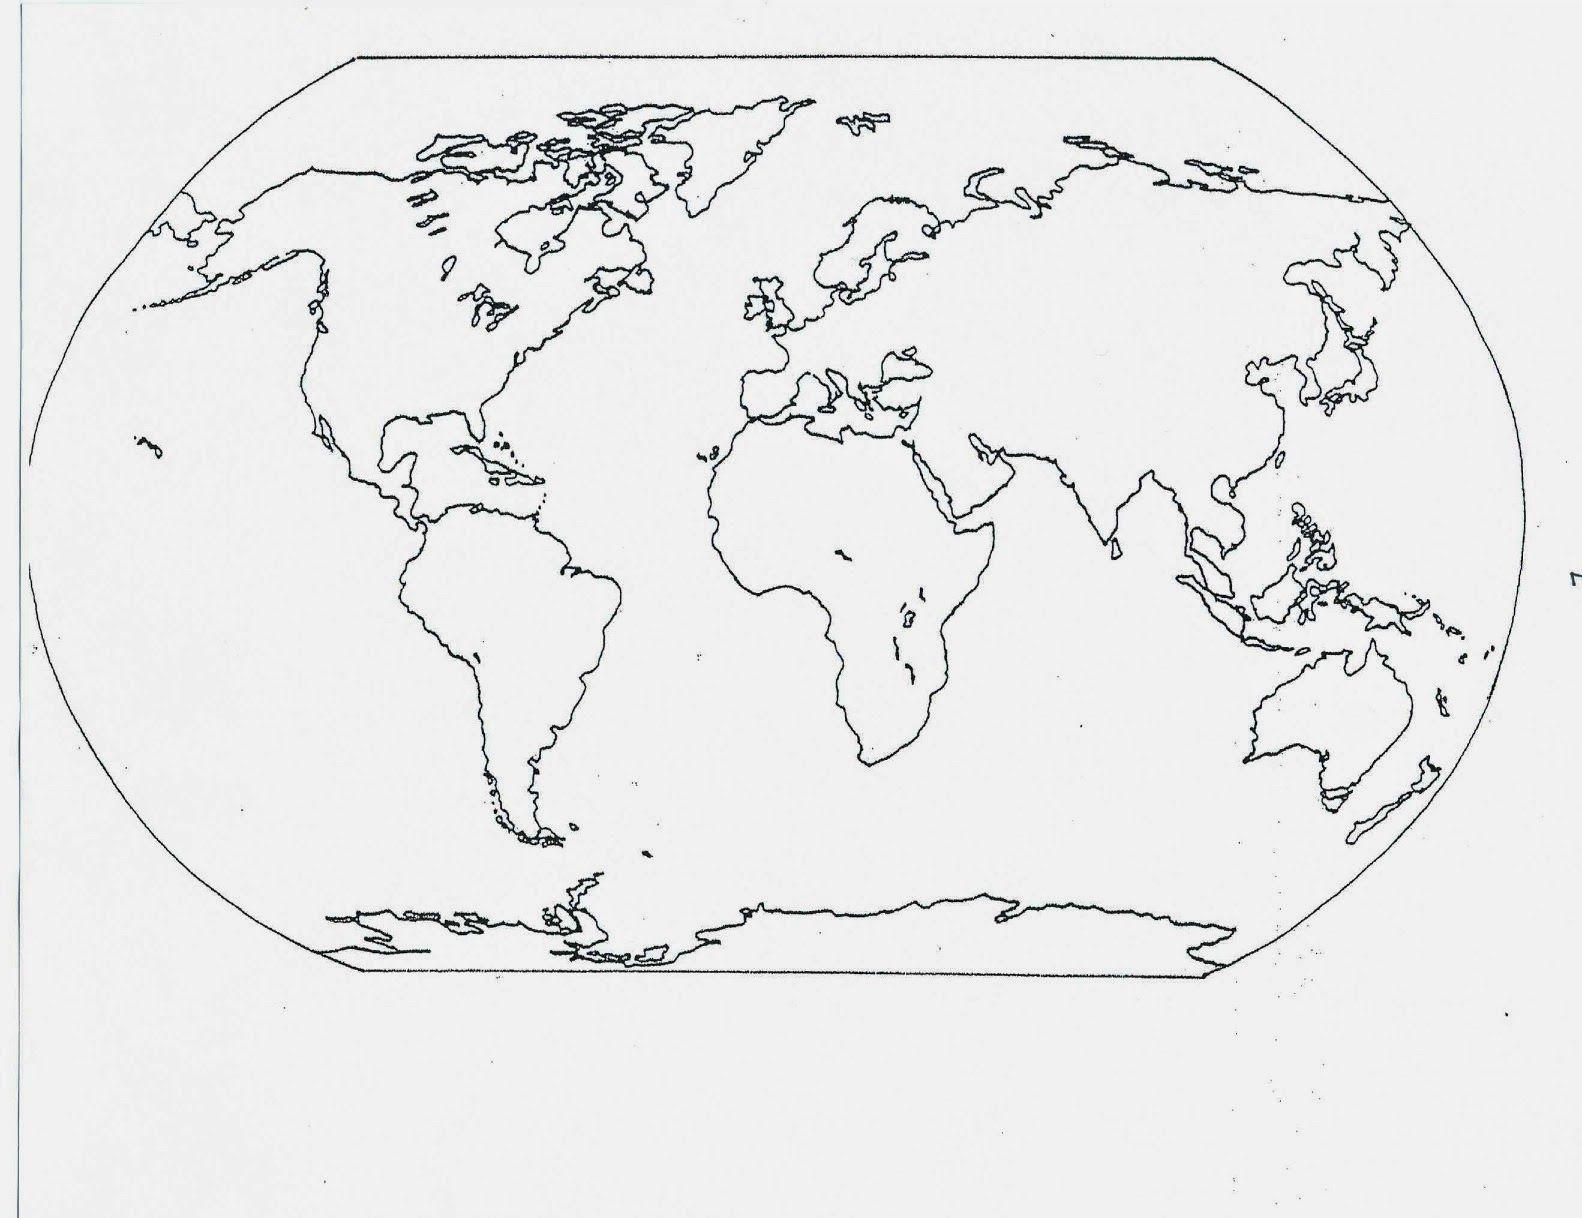 Catholic Schoolhouse Year 3 Free Printable Blank Maps